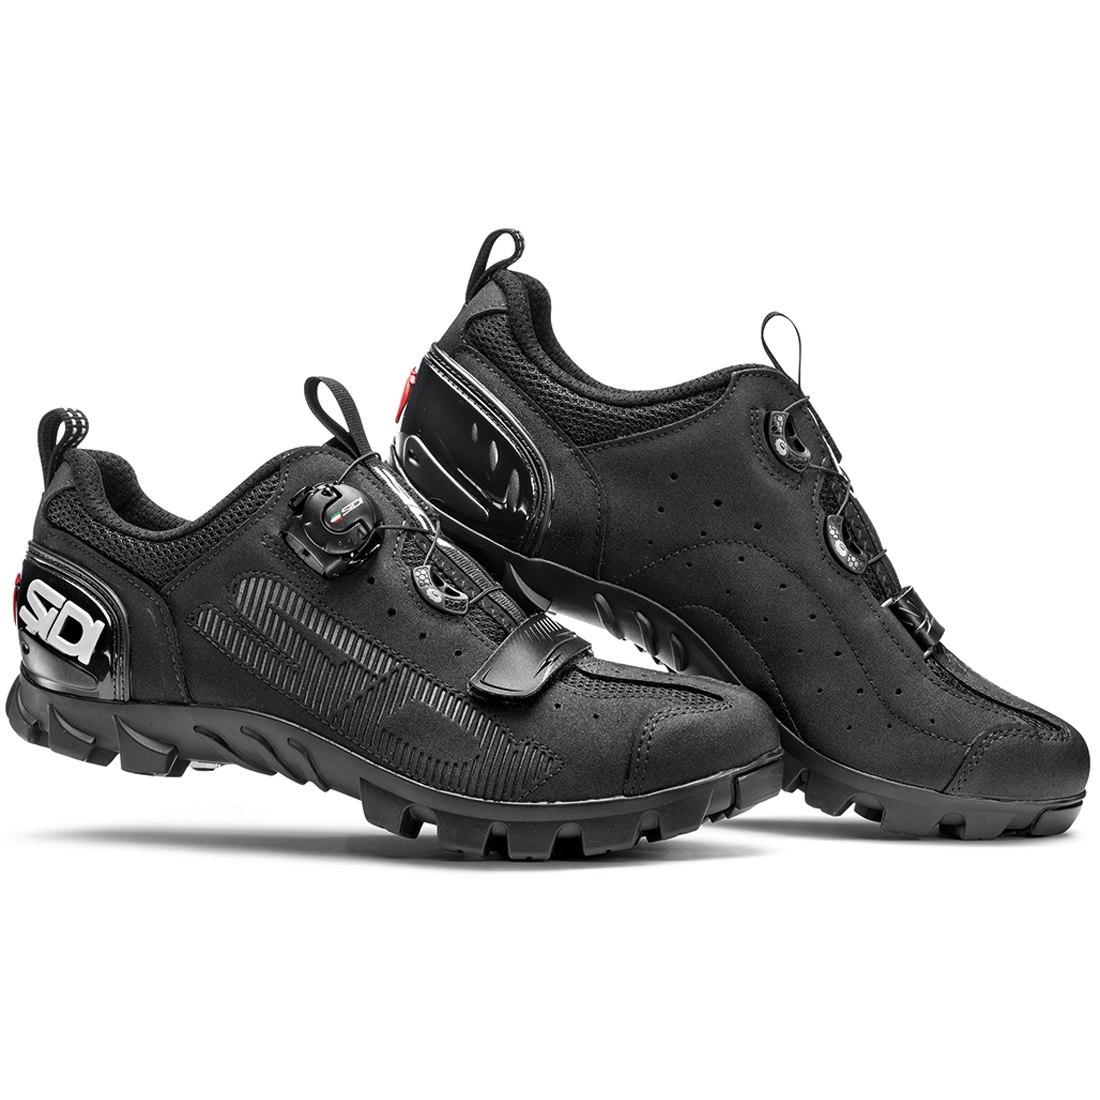 Image of Sidi SD15 MTB Shoe - black